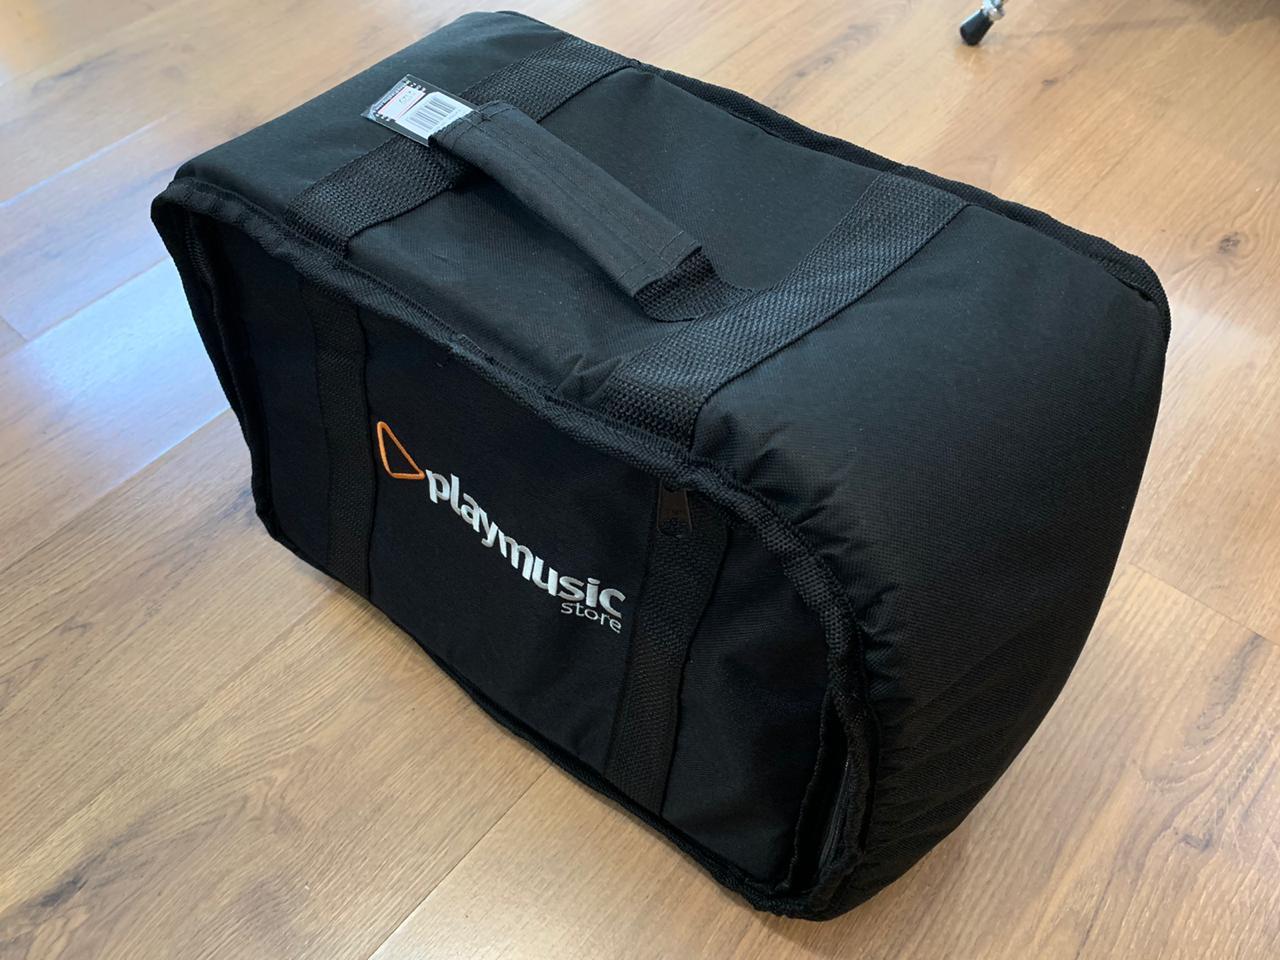 Bag Para Pedal Duplo Playmusic Store